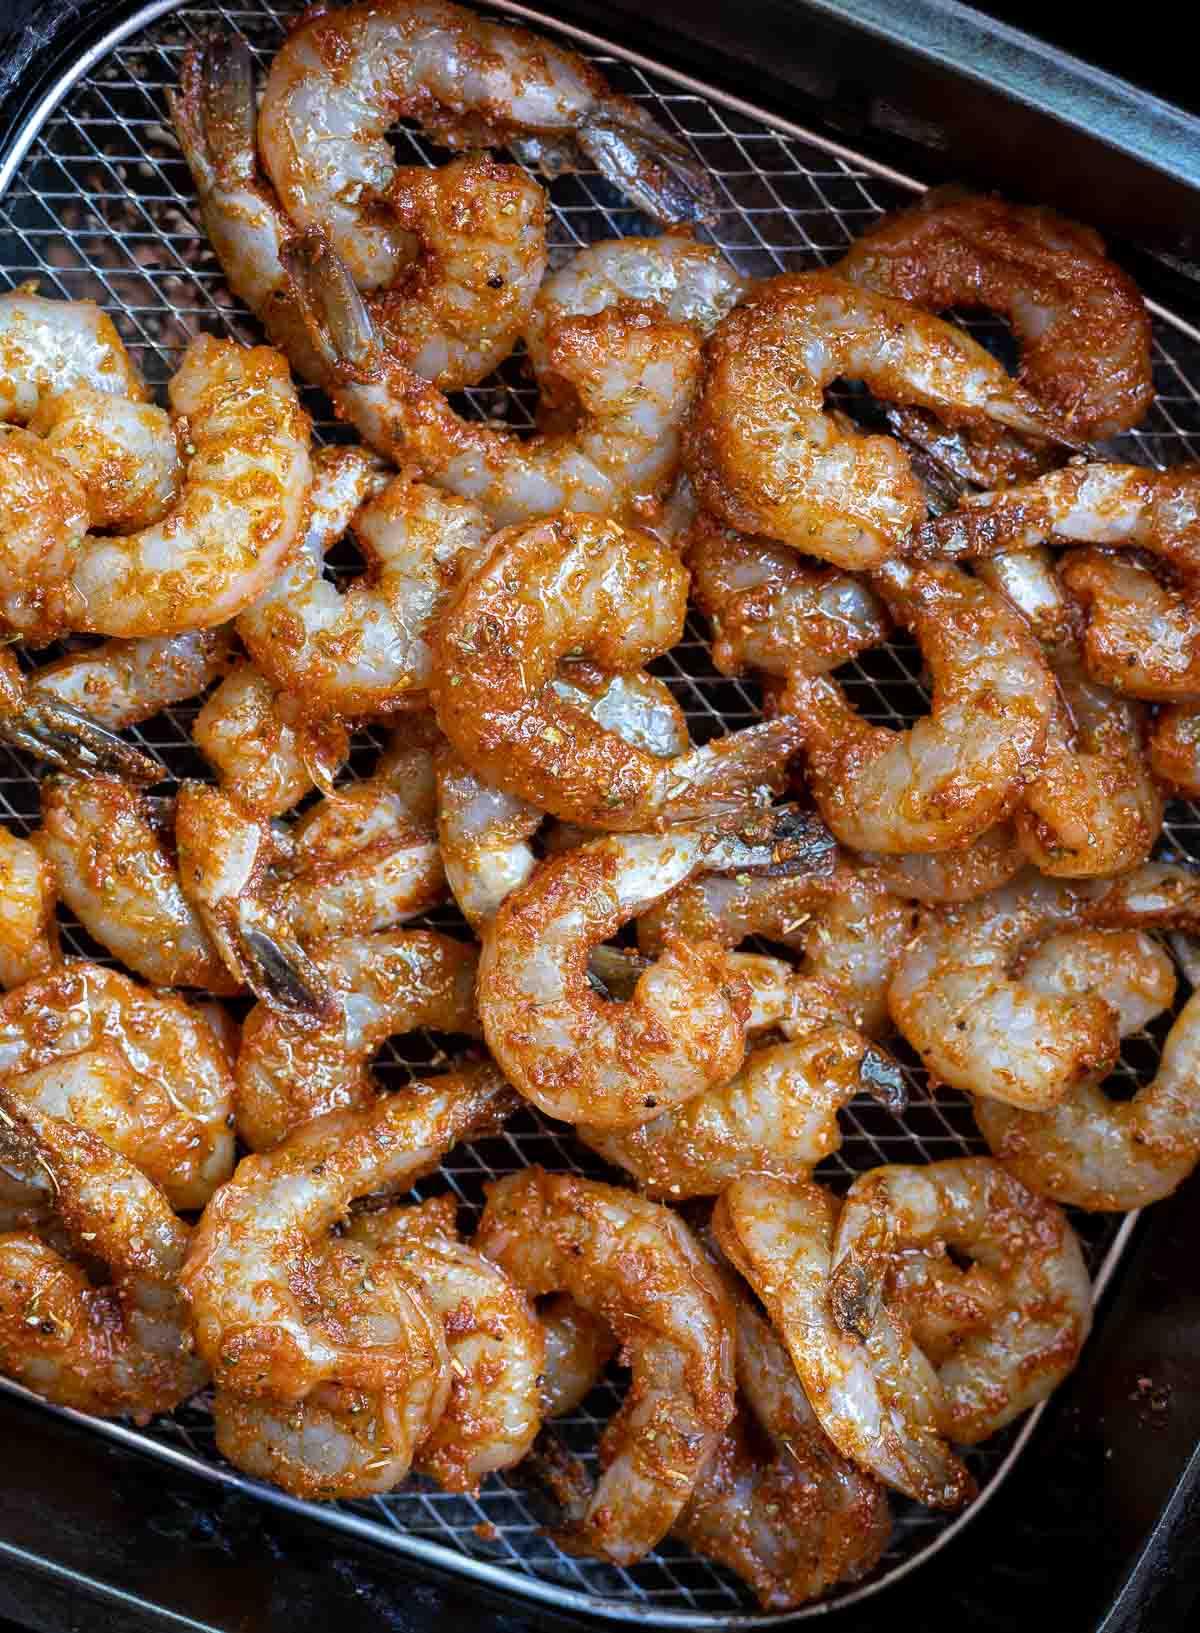 raw shrimp coated with blackened seasoning in air fryer basket